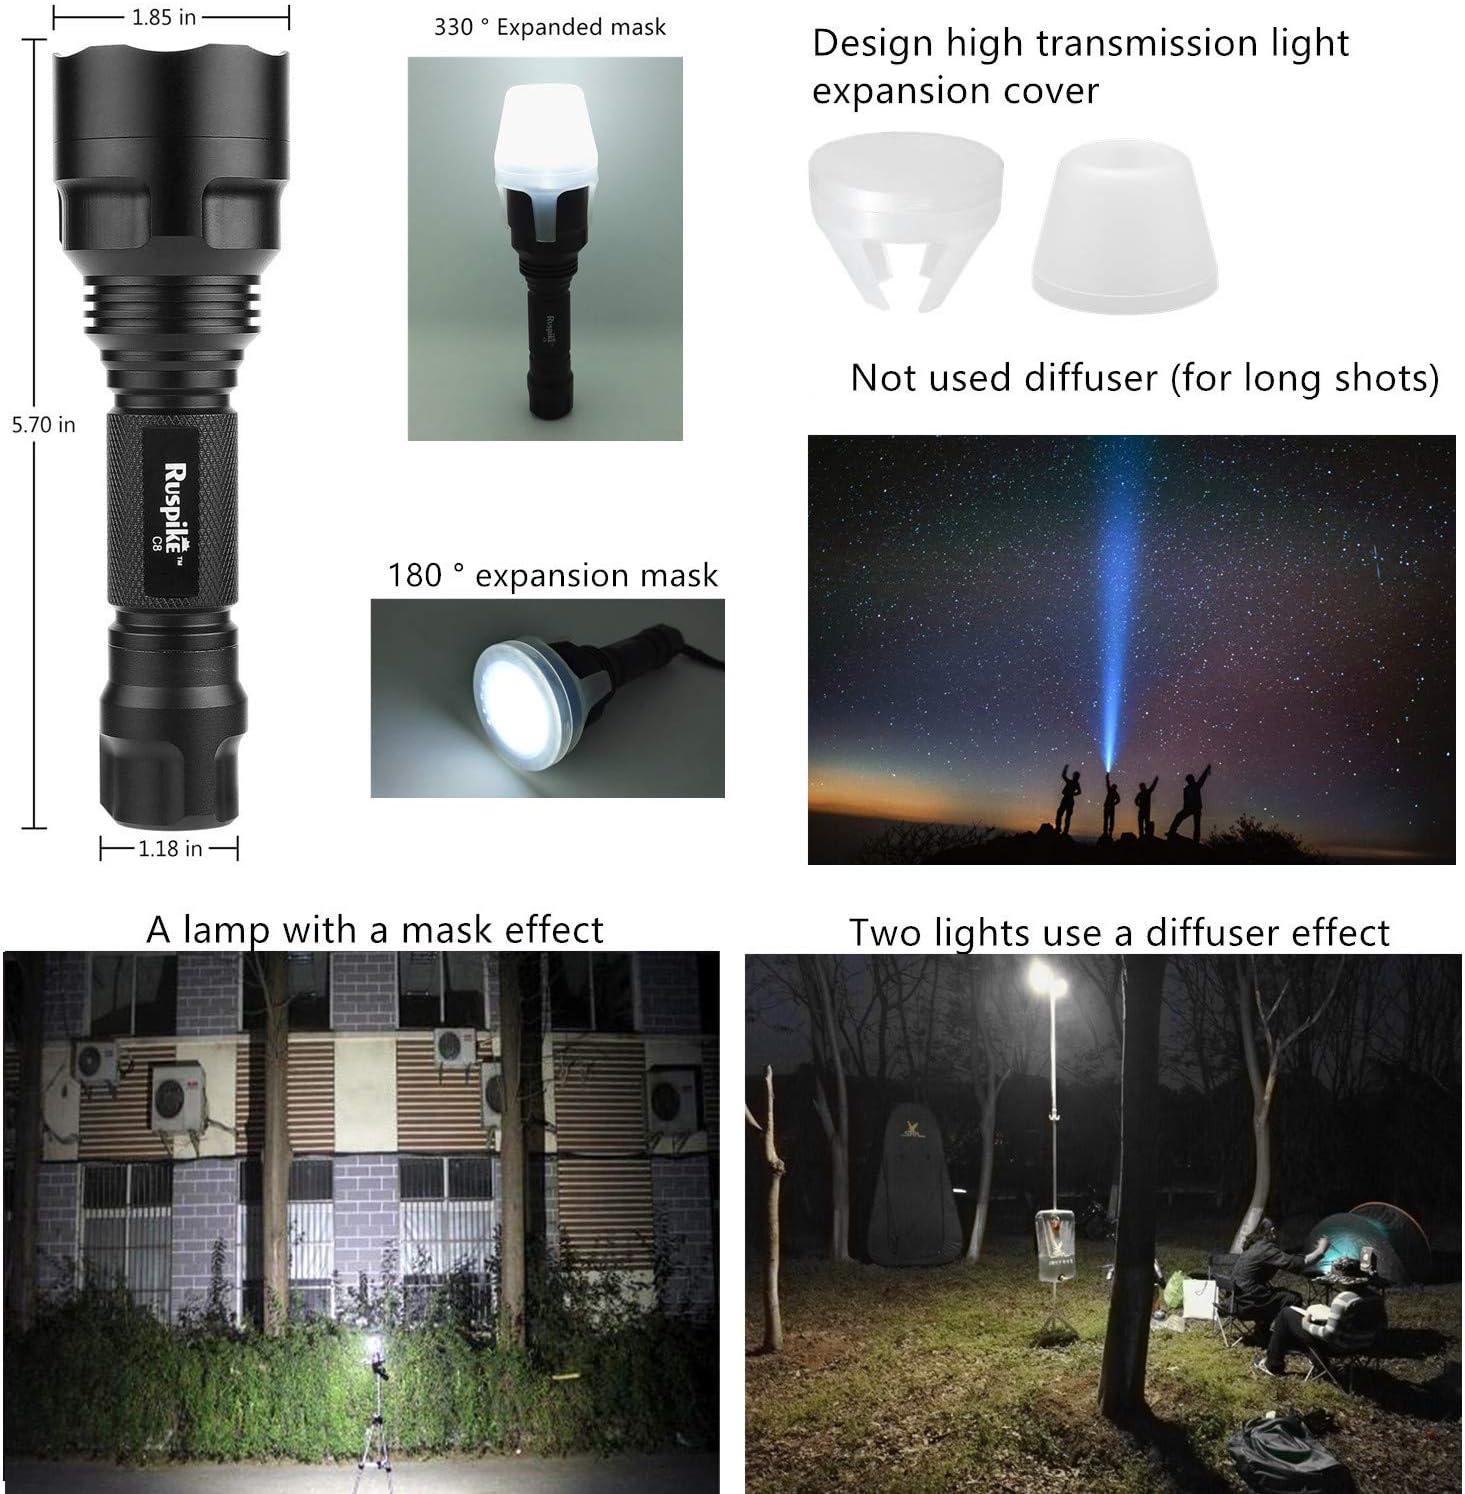 Ruspike LED Camping Lantern Flashlight Ultra Bright Multifunction Portable Waterproof Camping Lantern Light Perfect for Hiking Outdoor Emergency etc.